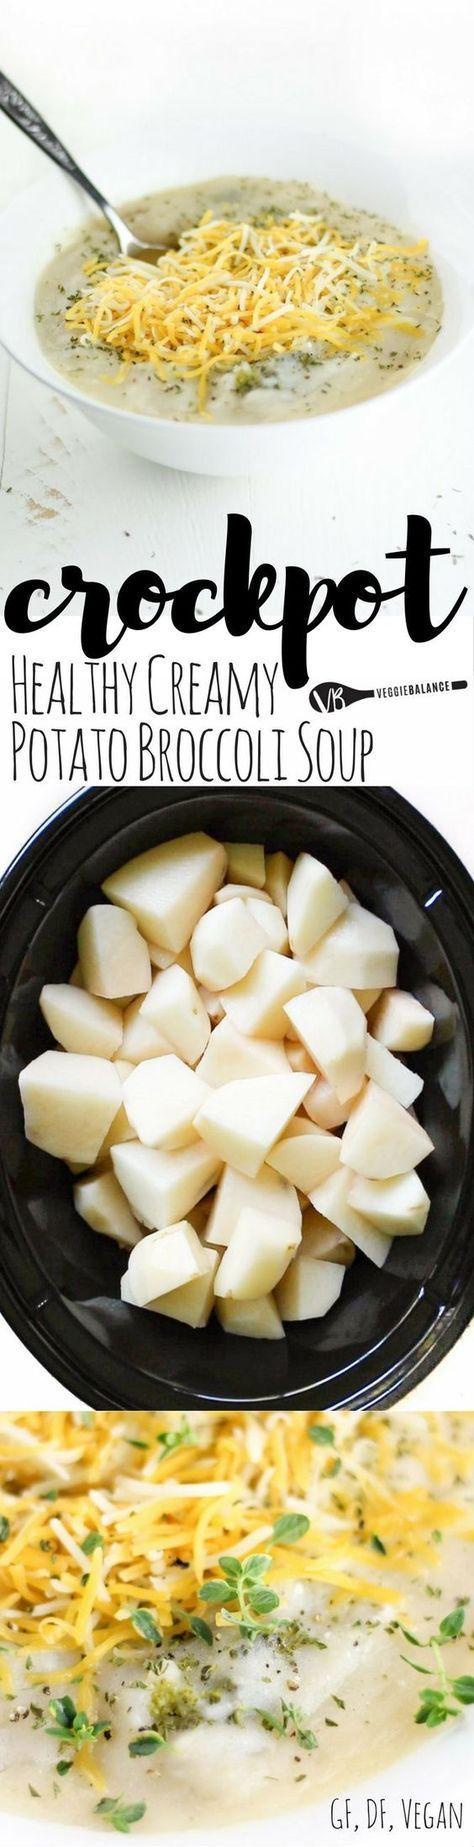 Dairy Free Crockpot Broccoli Potato Soup Recipe Made Healthy It S Delicious It S Creamy And It Is Chock Full Of P Vegan Crockpot Recipes Vegetarian Crockpot